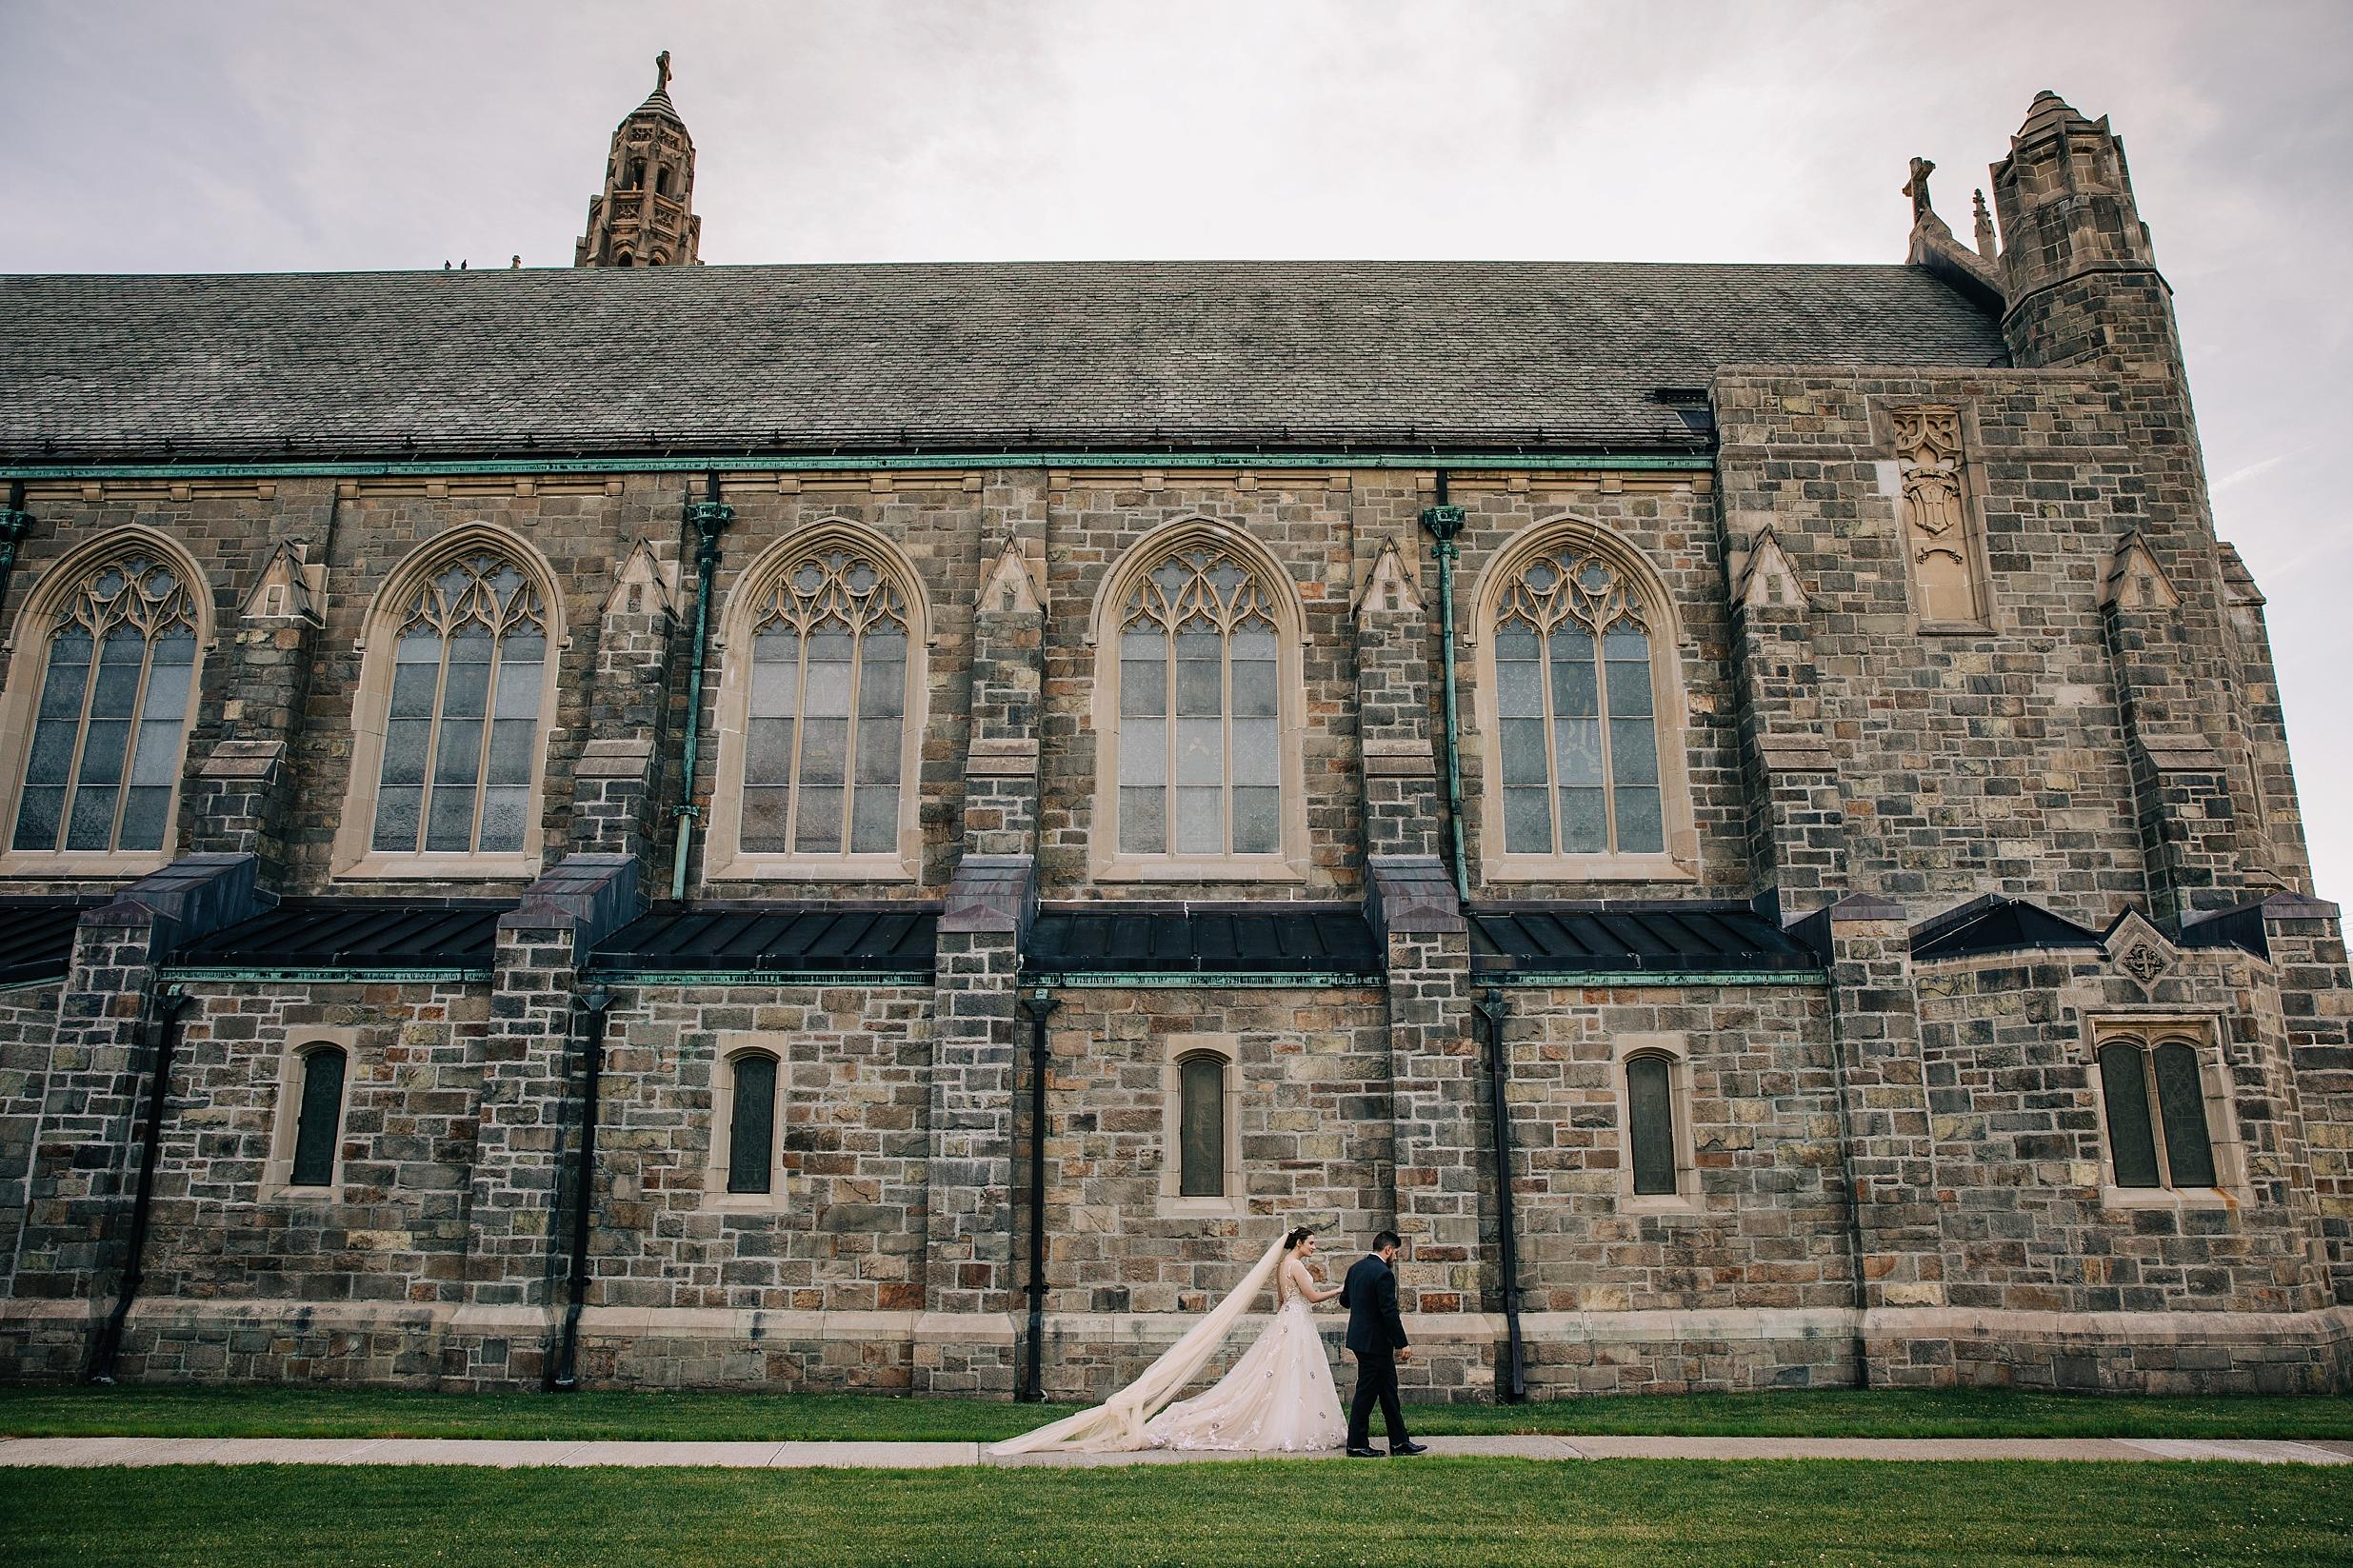 historic-upstate-ny-wedding-church-backyard-photographer_0024.jpg